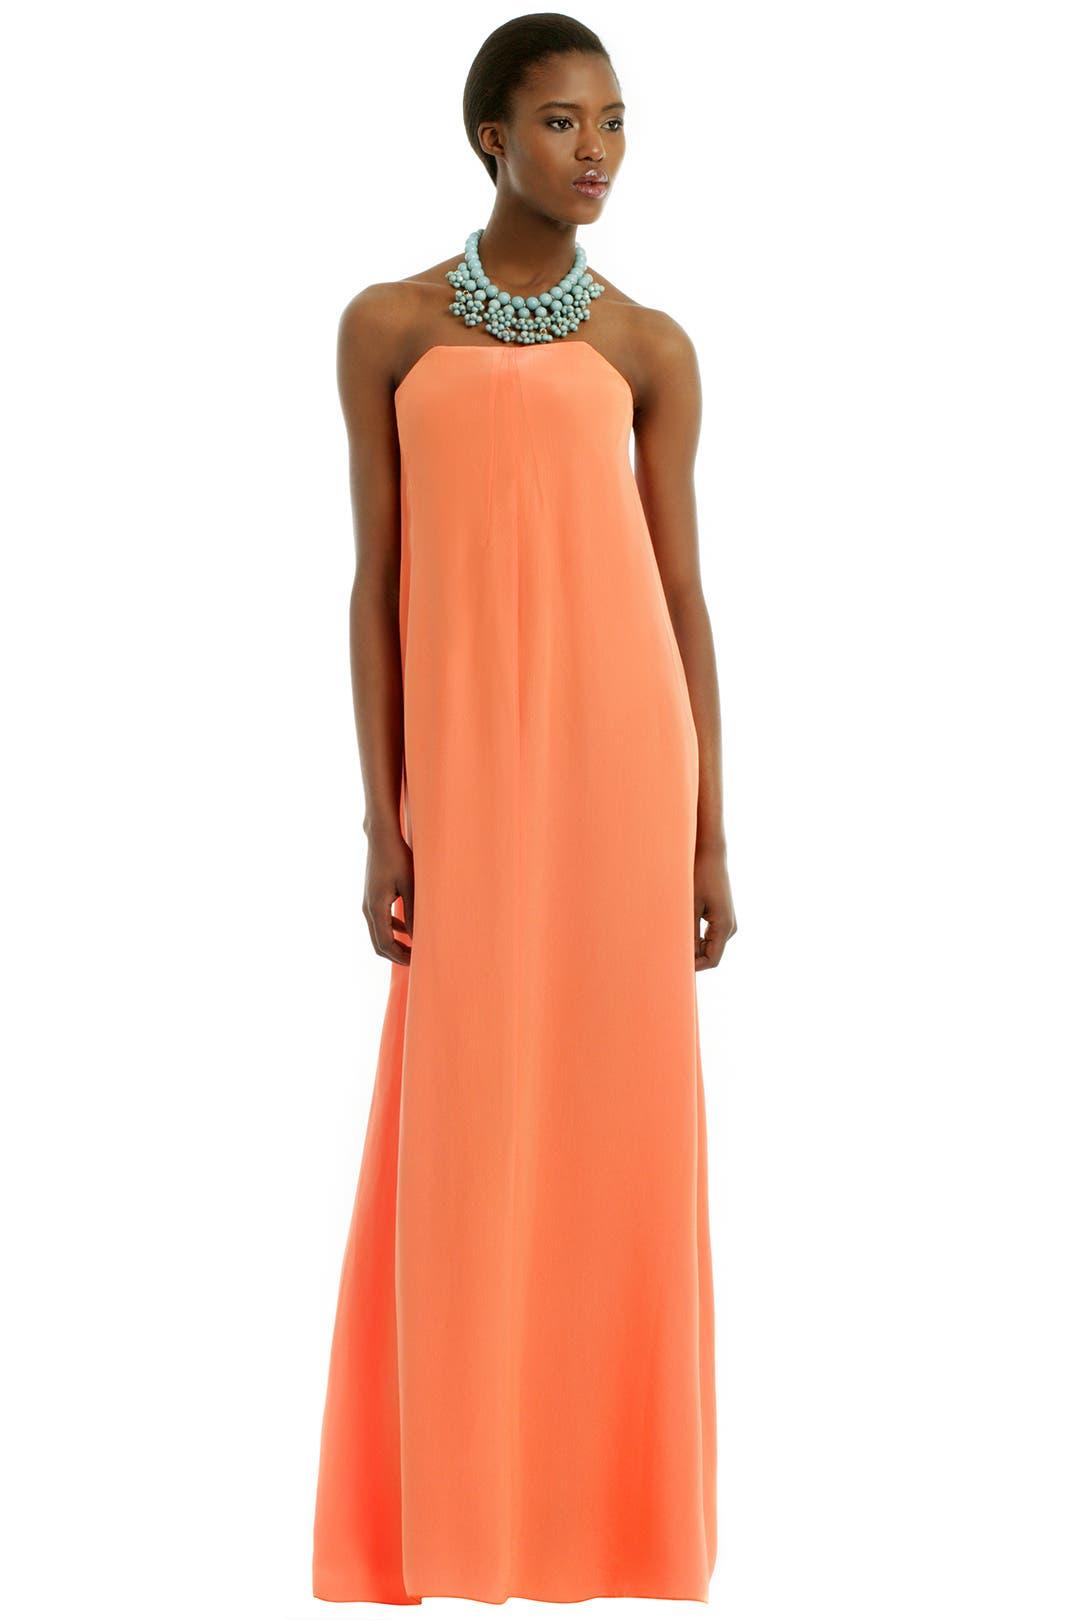 Tangerine Spritzer Gown by Cedric Charlier